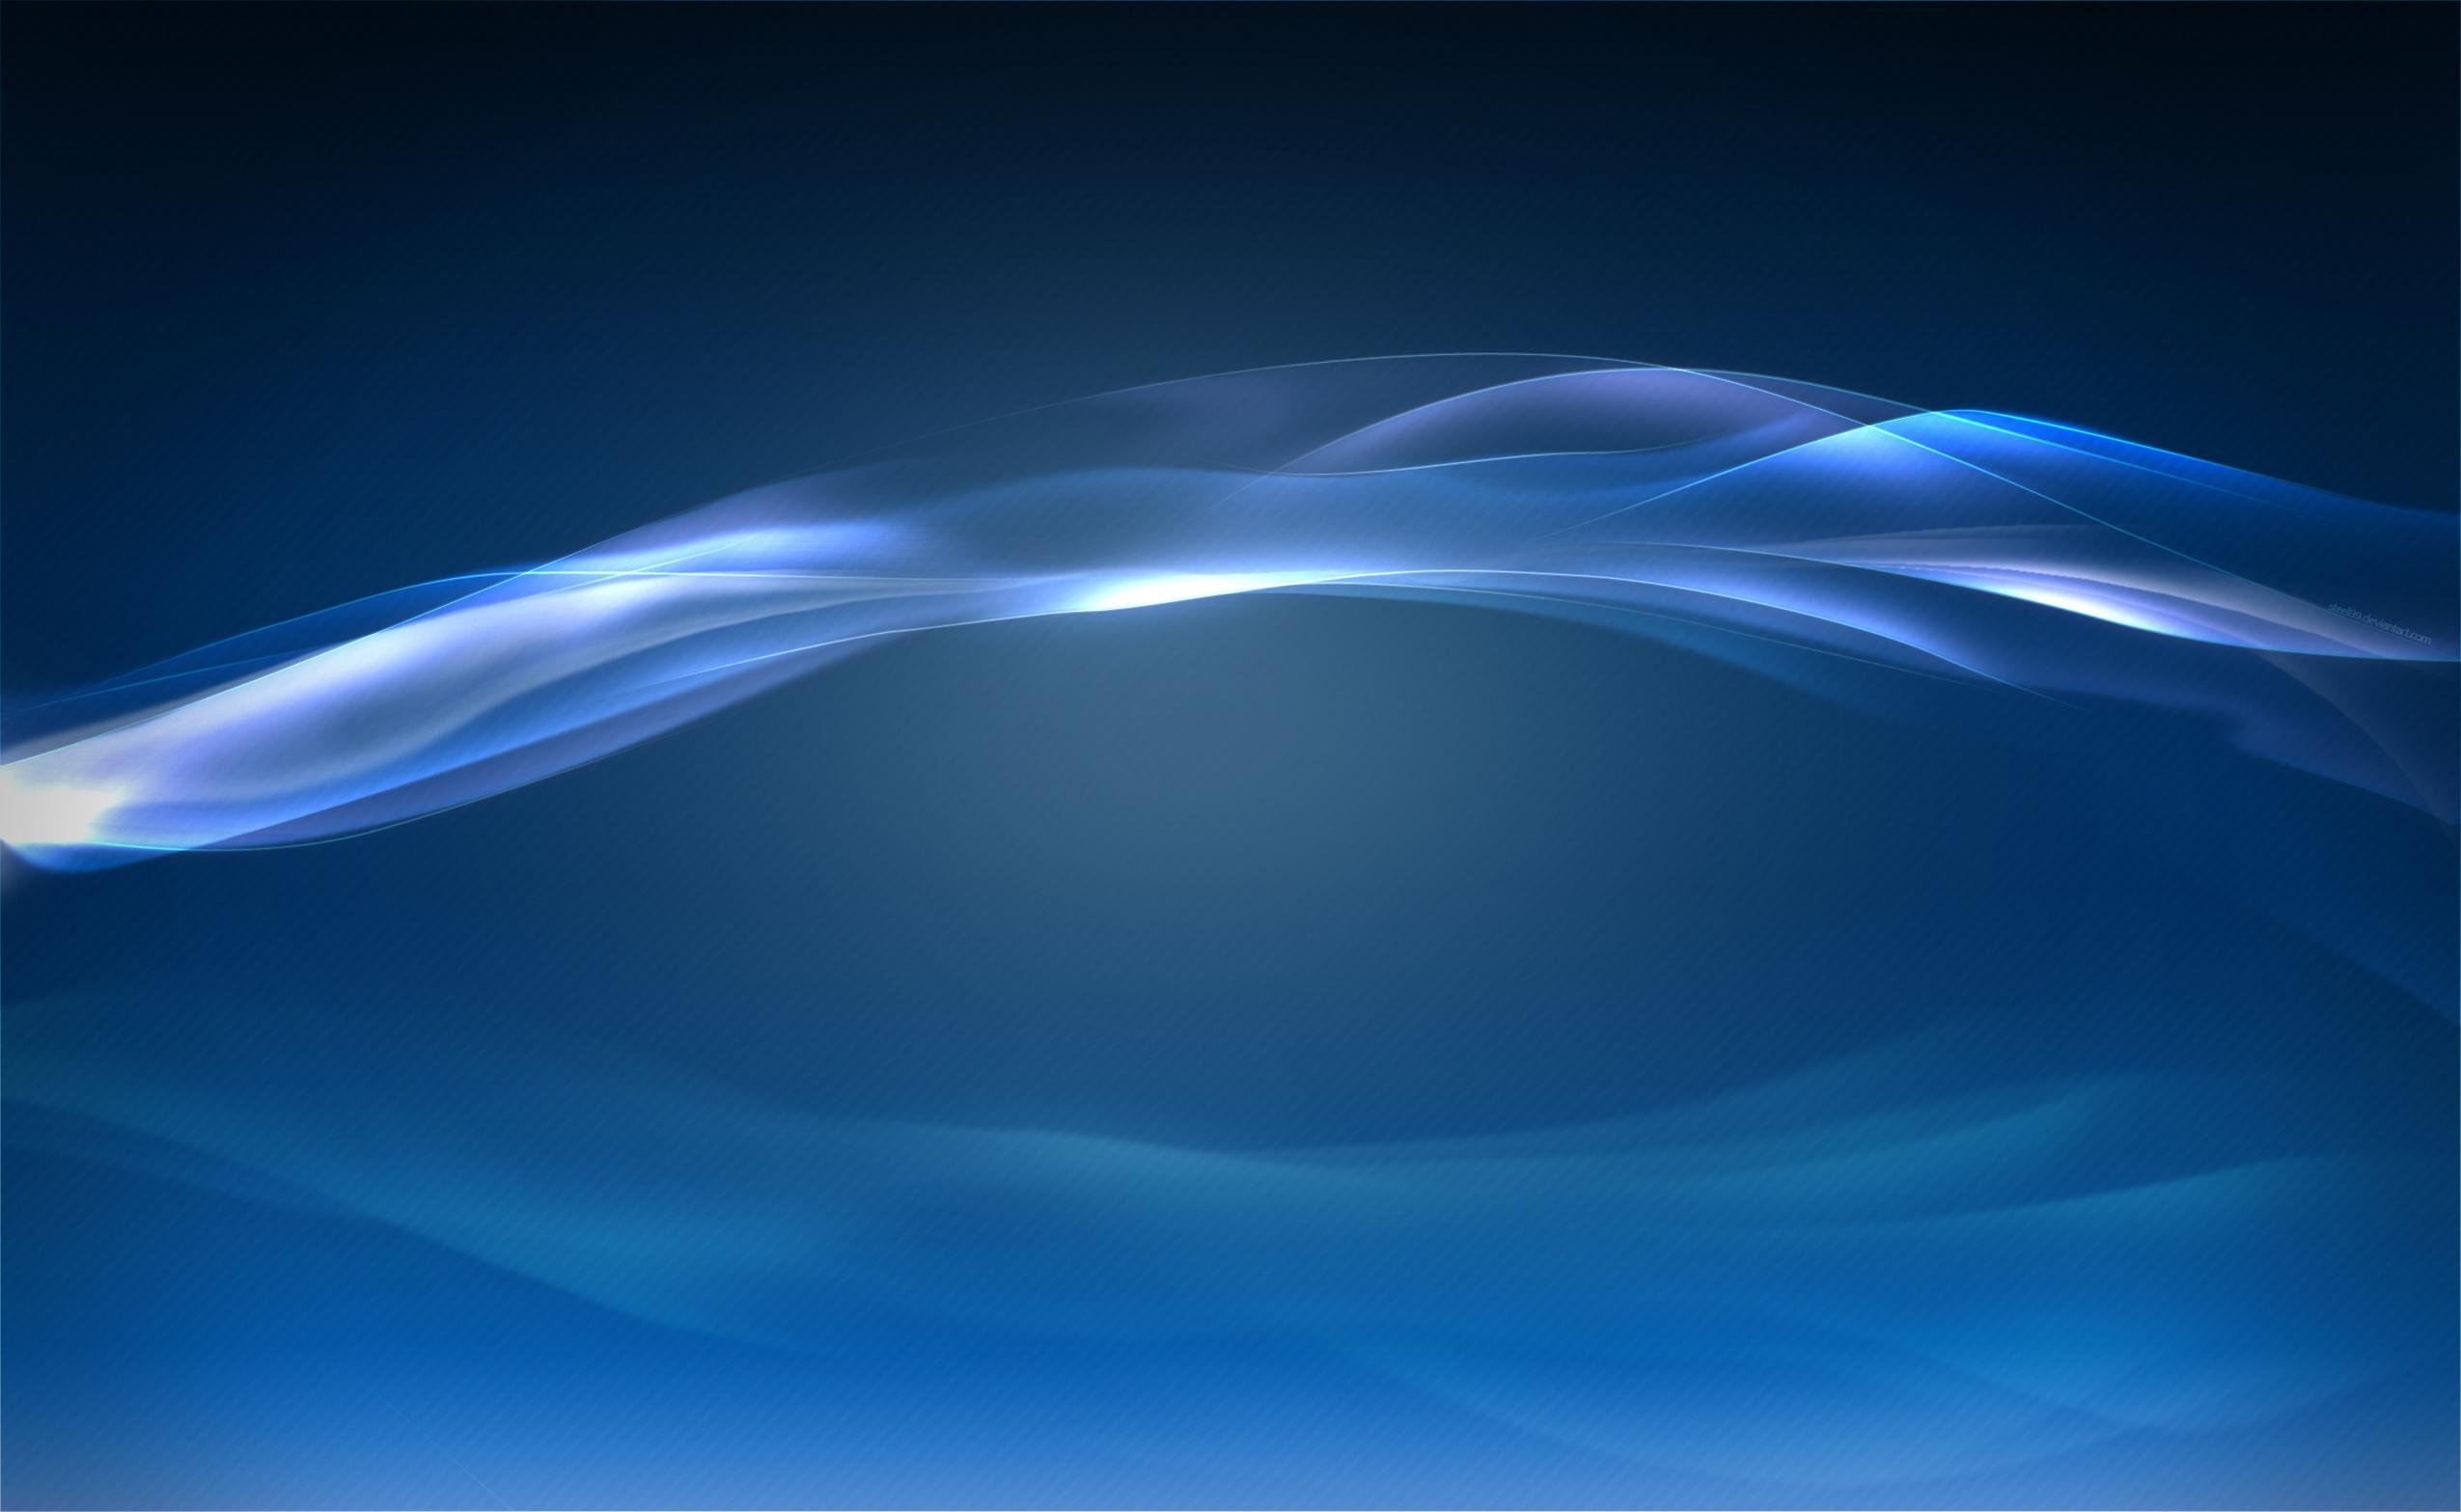 Hp Full Hd Wallpaper Dark Blue Background Free Download Pixelstalk Net